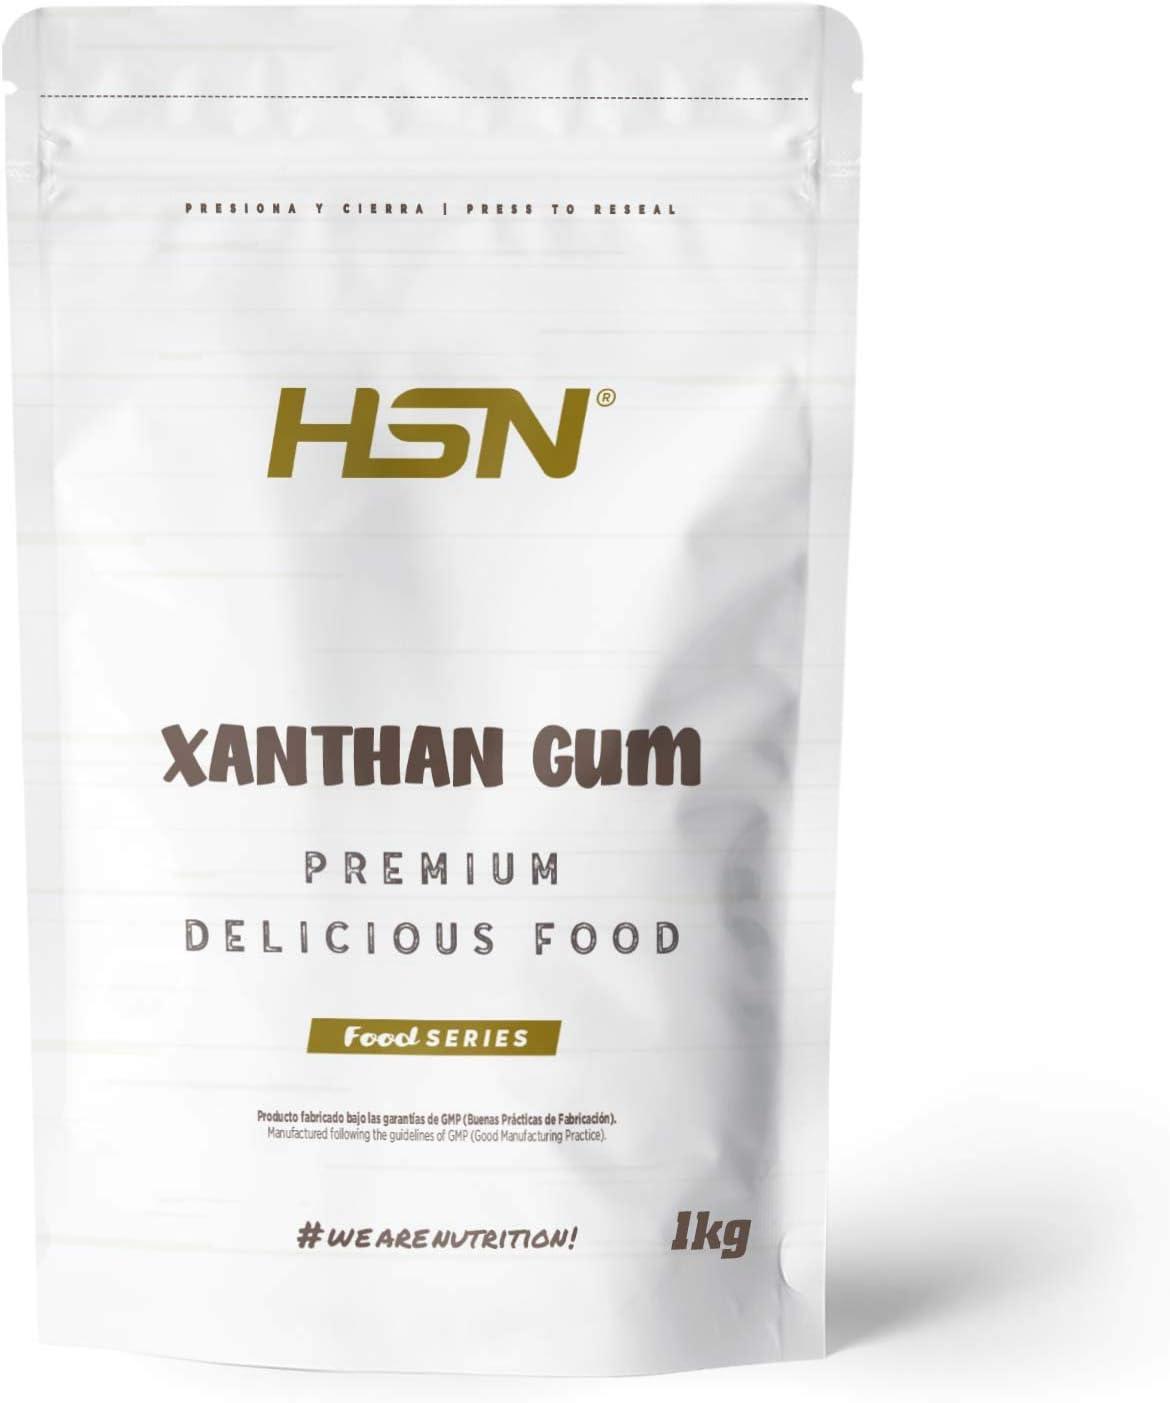 Goma Xantana de HSN | Espesante Alimenticio | Ideal para Recetas Fitness | Fibra Soluble para dar Espesidad | Vegano, Sin Gluten, Sin Lactosa, En ...